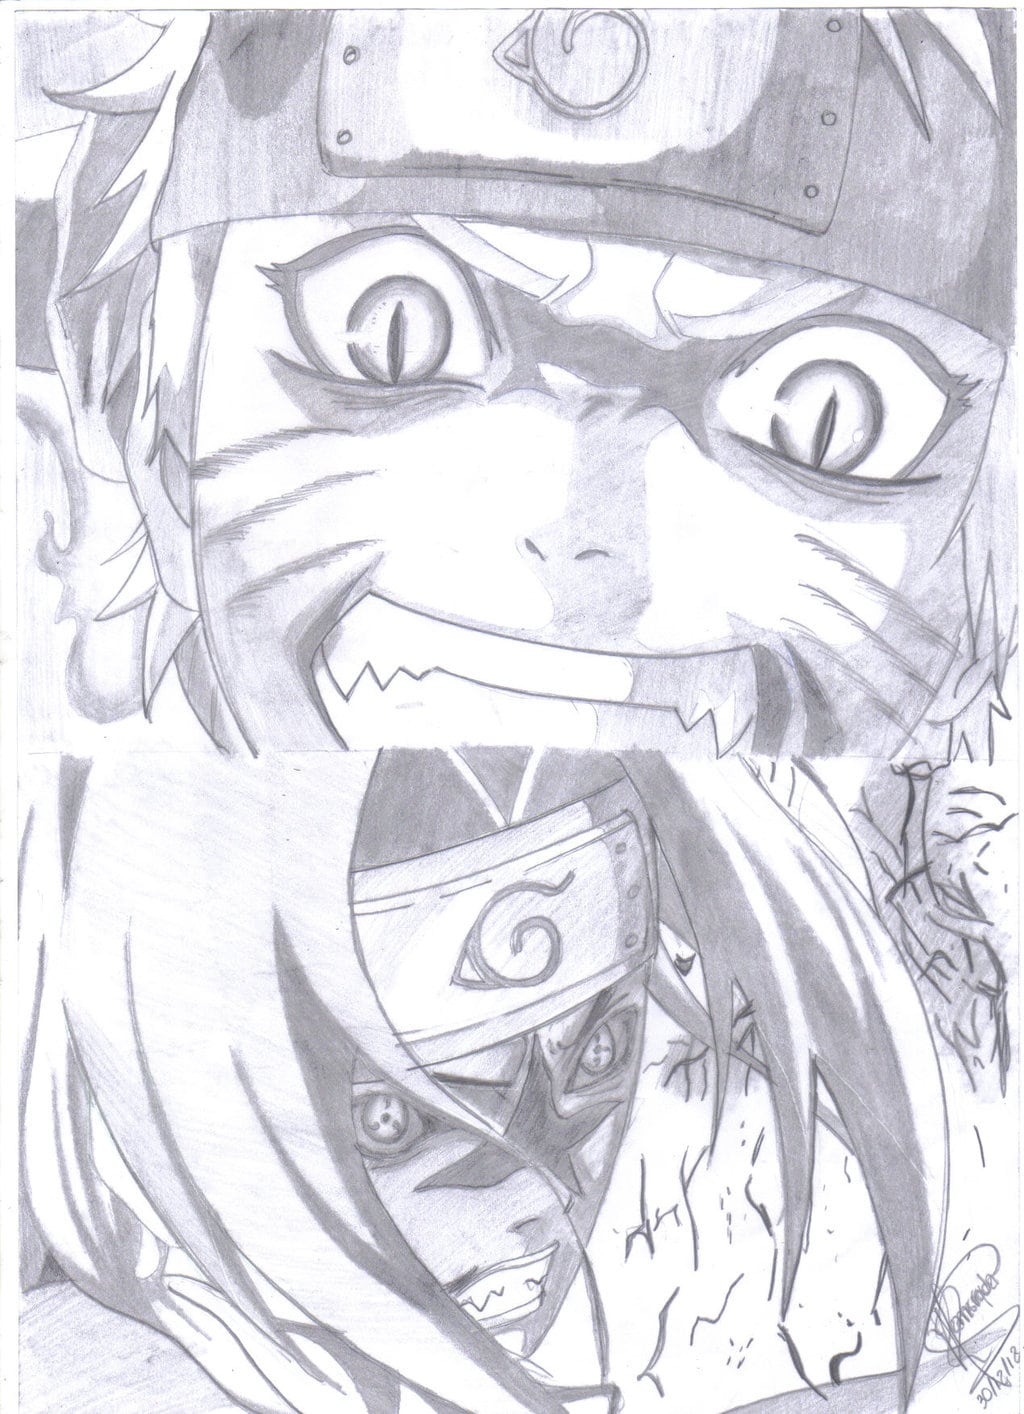 Naruto Vs Sasuke Meu Desenho 2 By Ronstadt Deviantart Com On